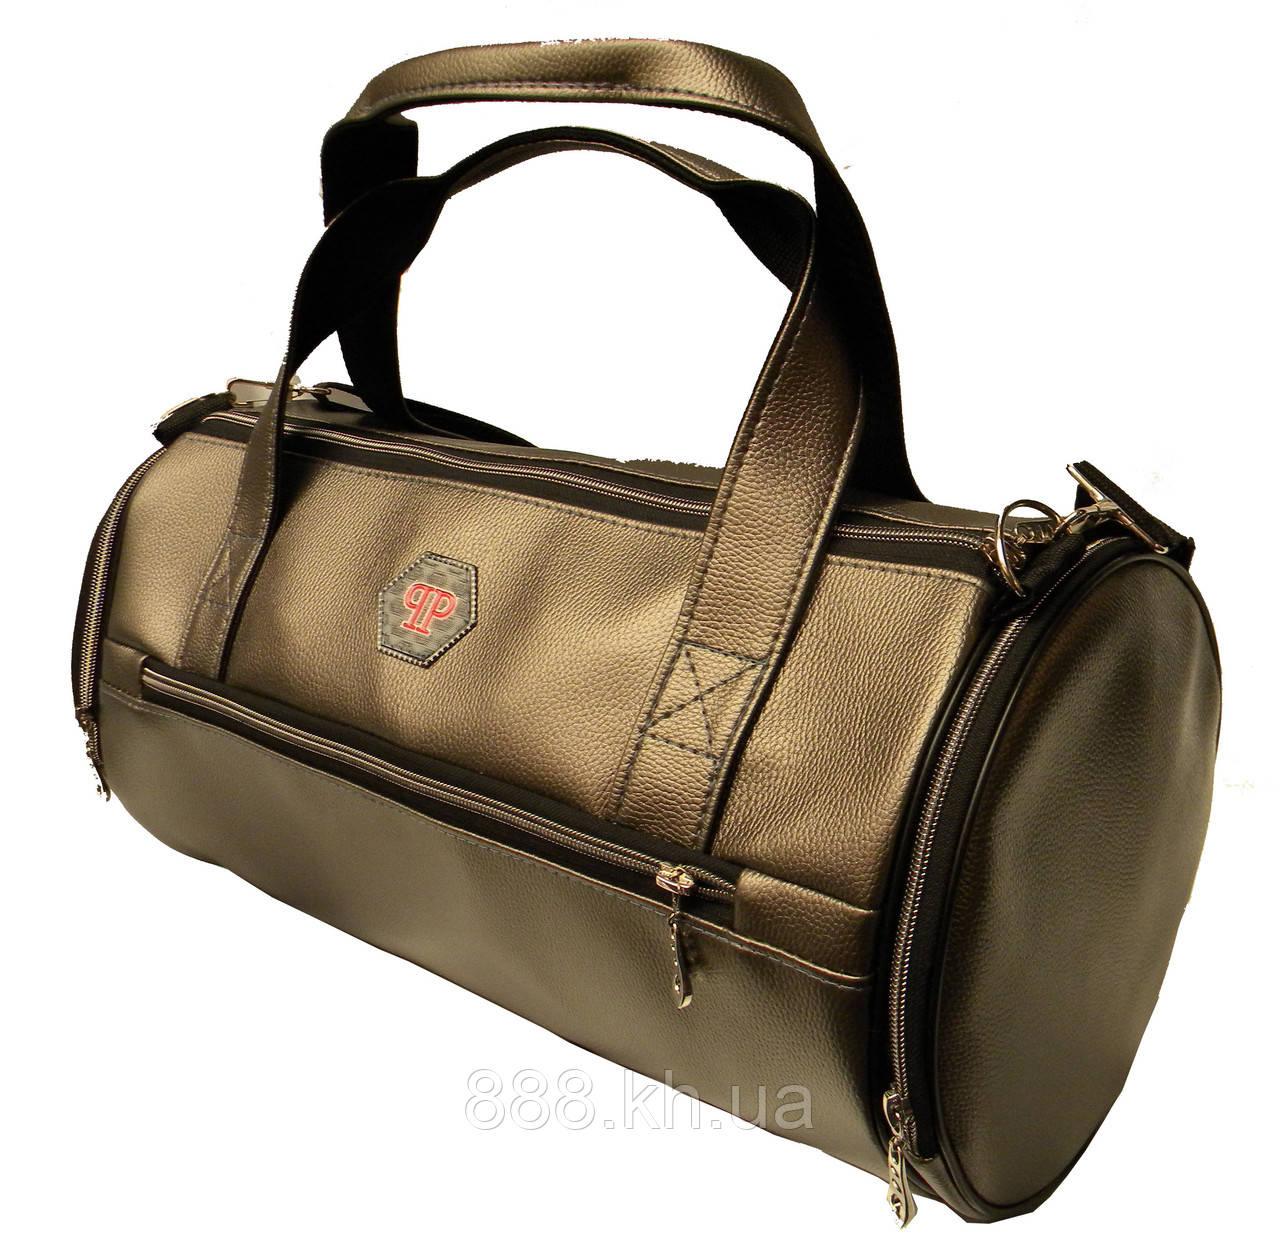 Кожаная сумка бочка 9ee75ecbb0806